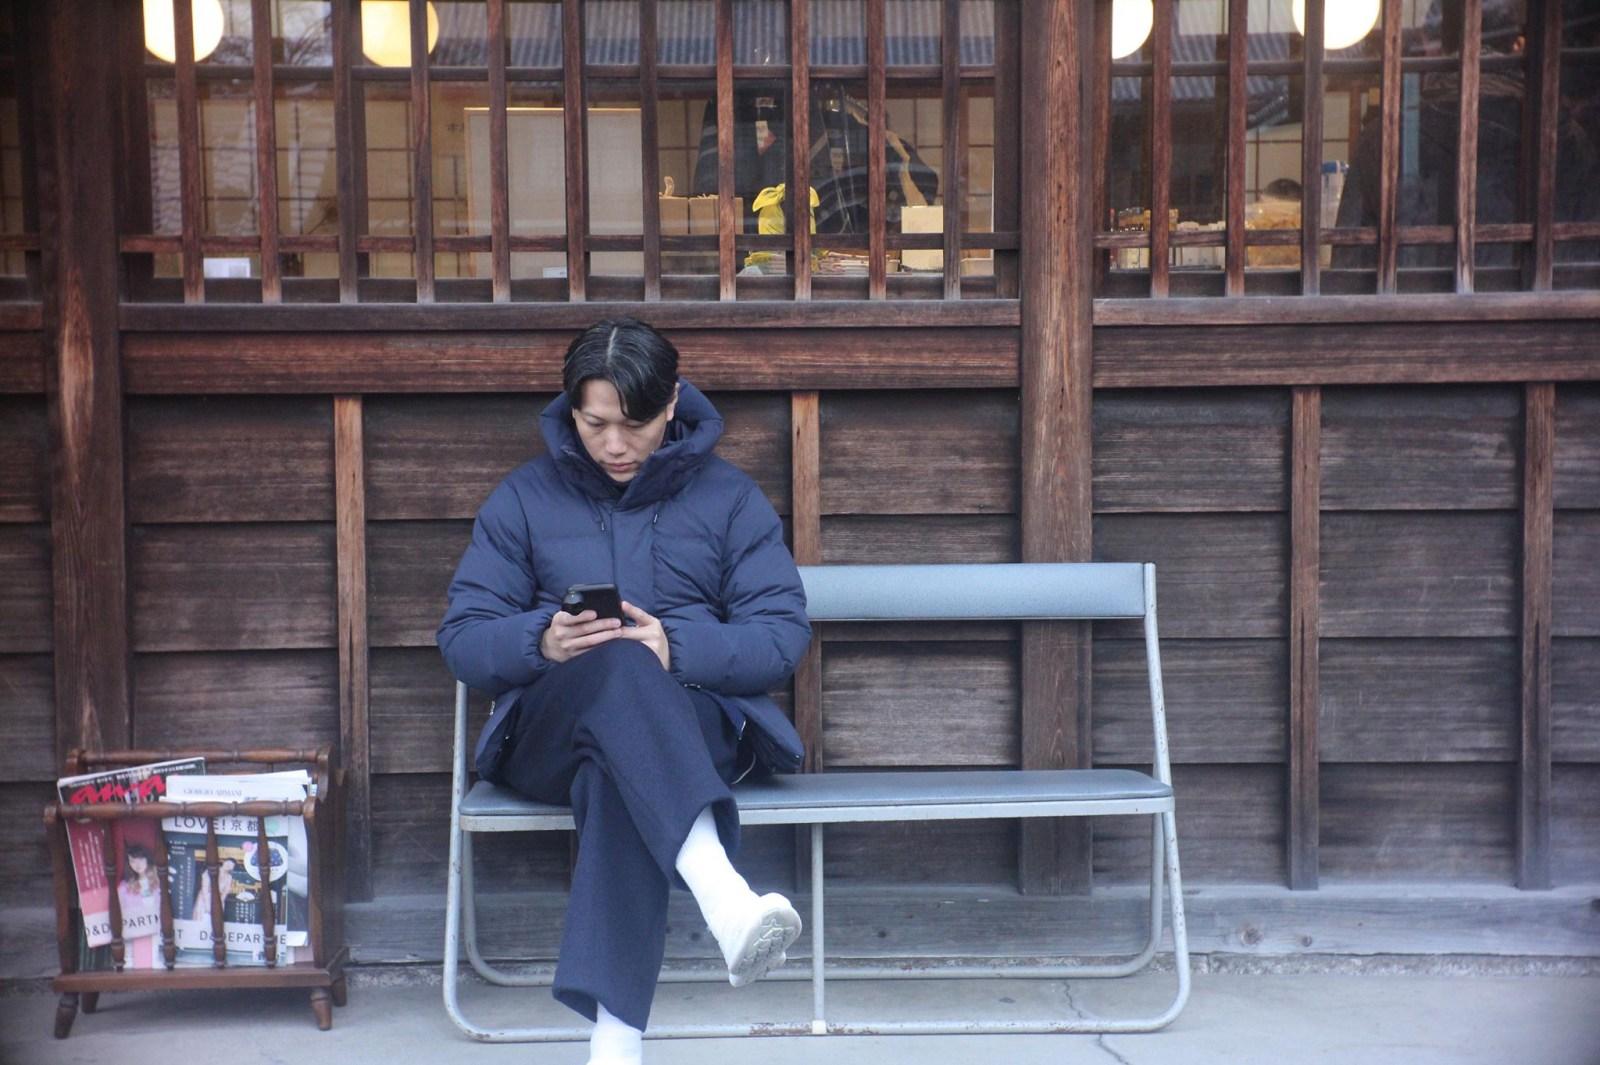 wisdom 主理人 Hans 親自讲解品牌 2018 秋冬系列